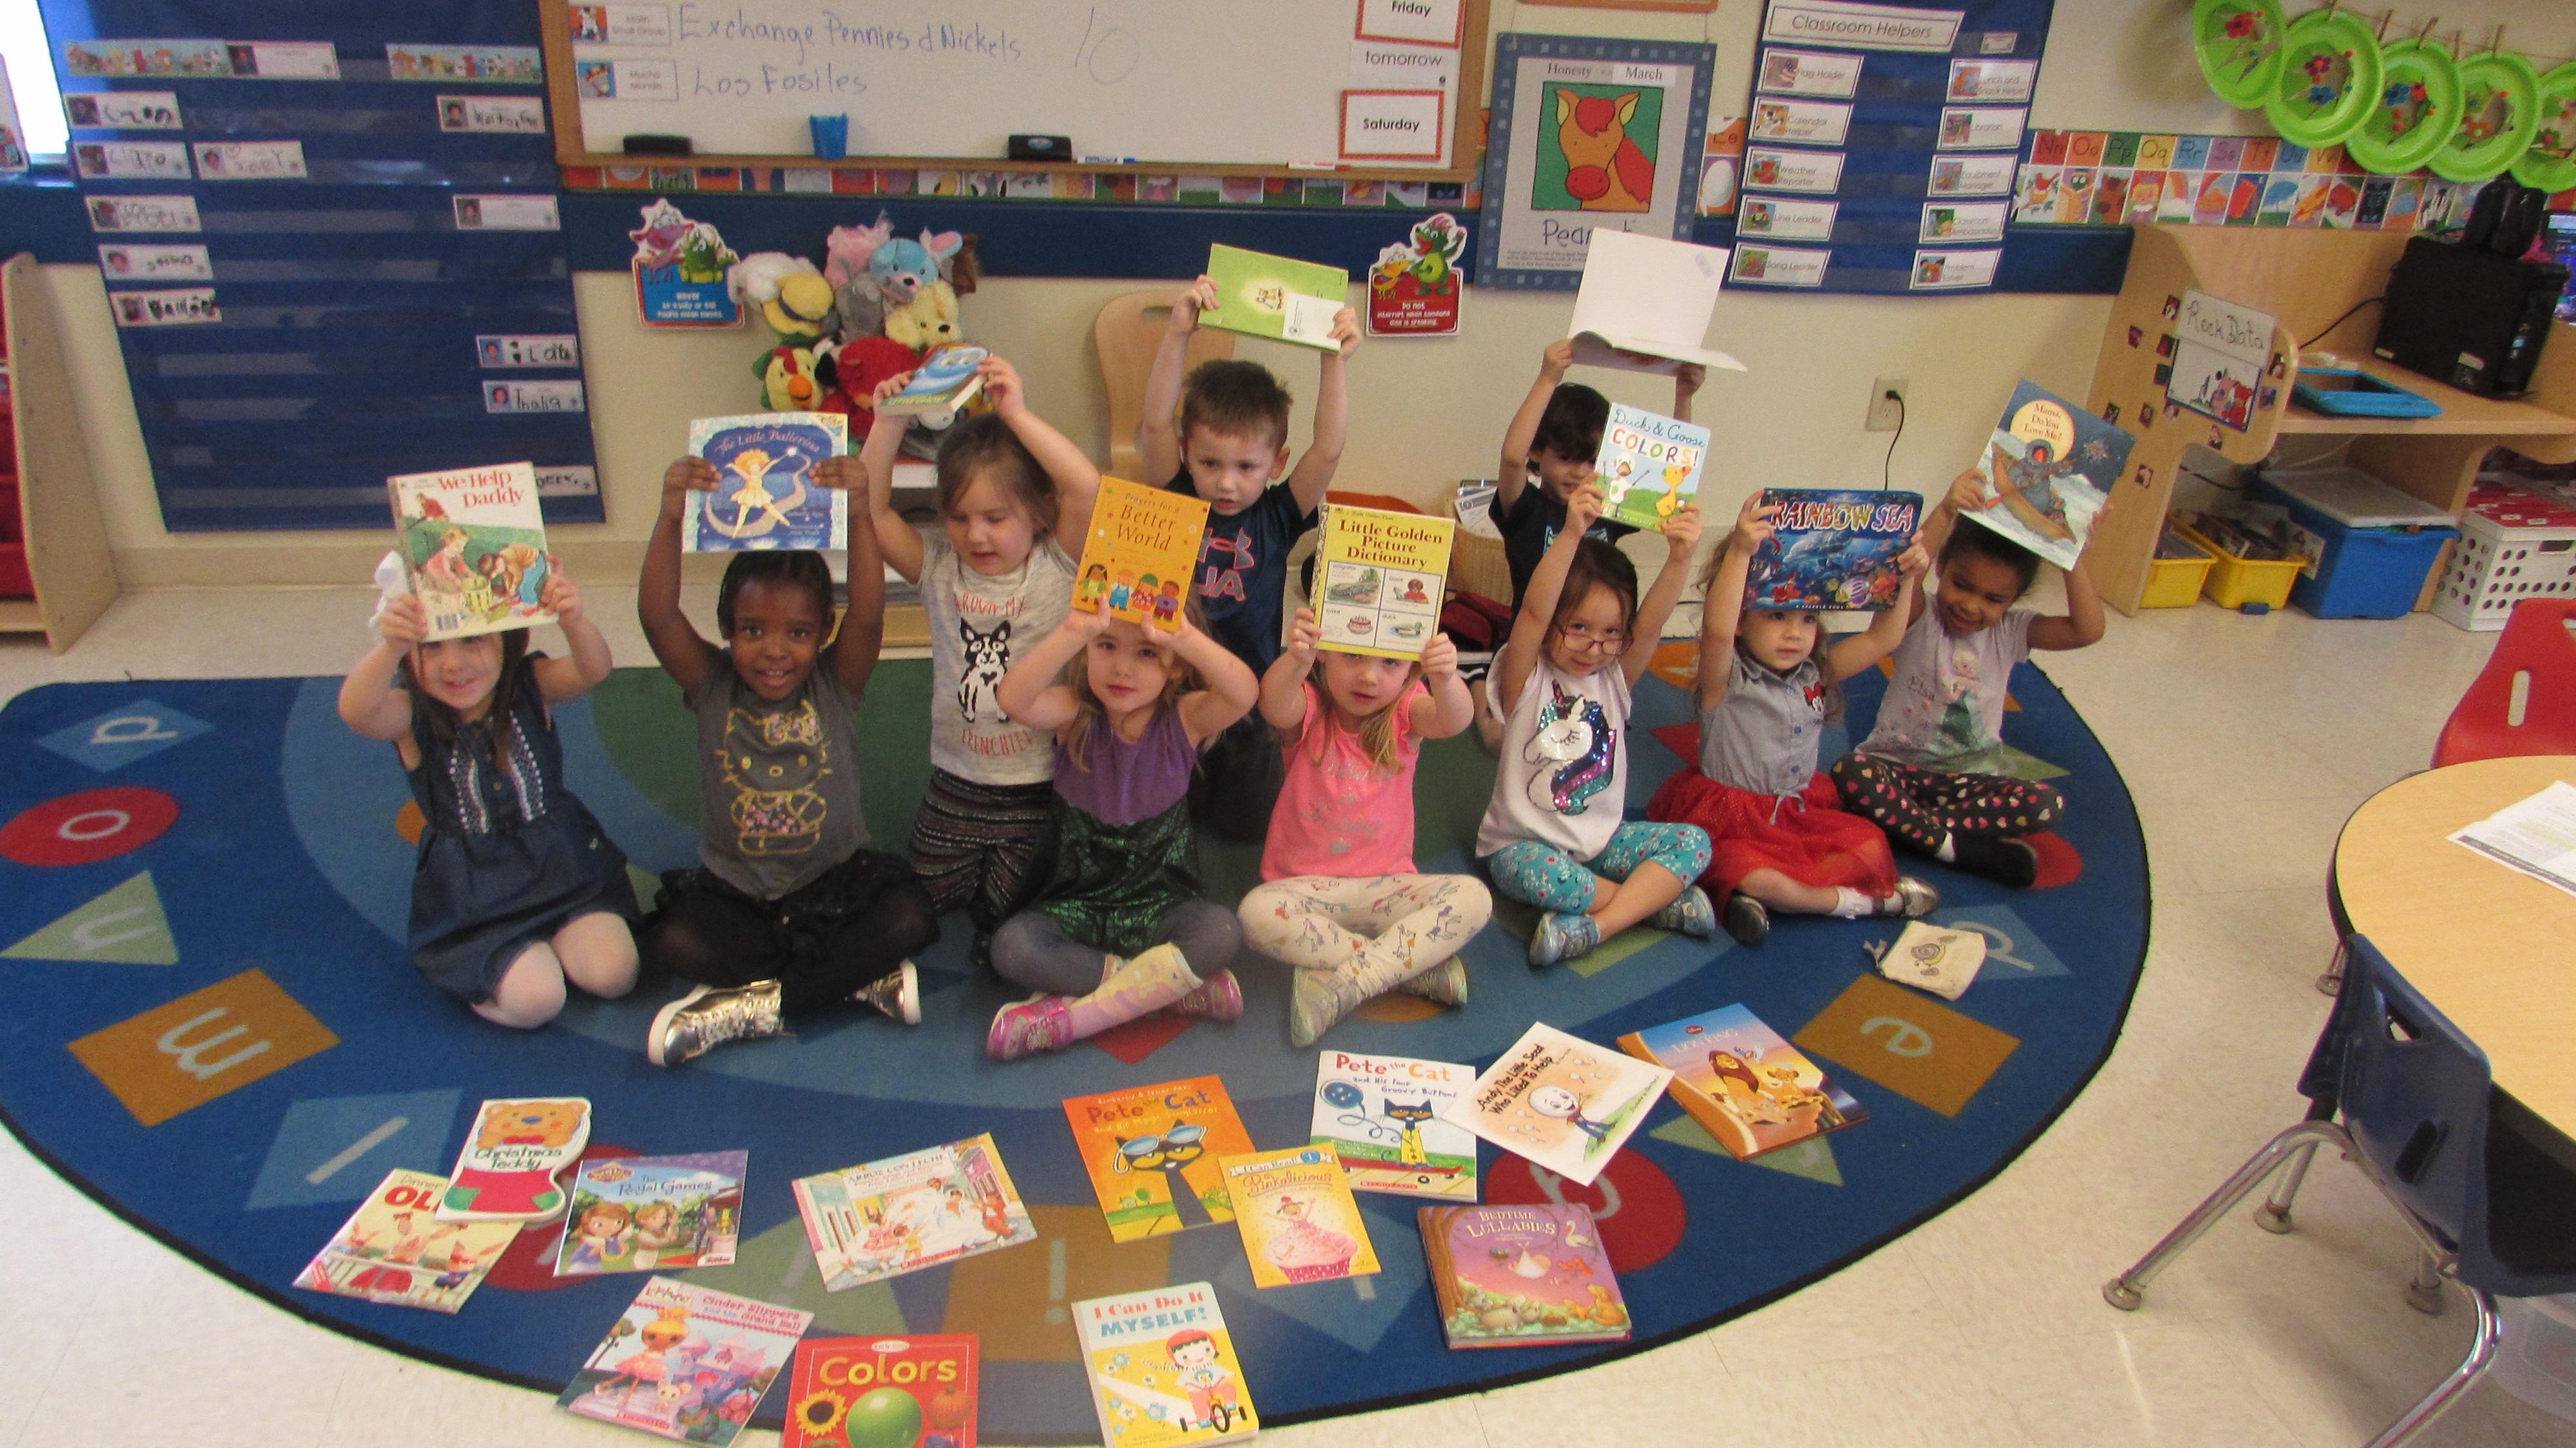 Primrose School of Clear Lake Educational Child Care Donates Books in Celebration of Read Across America